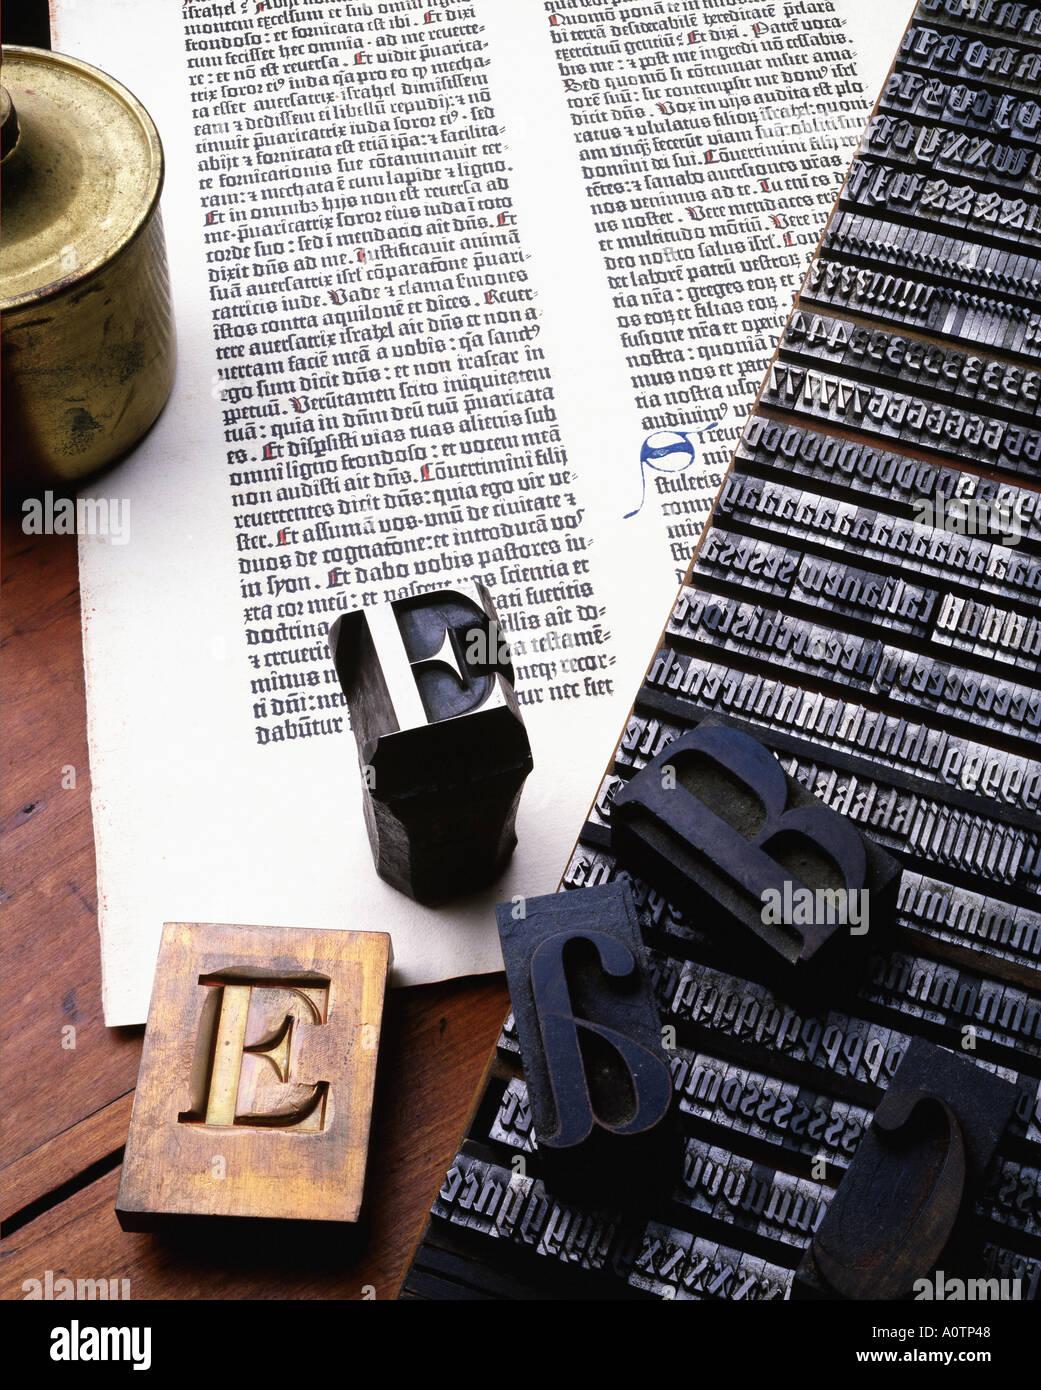 Das Leben der antike Metall, Holz block Gravur und Hand beleuchtete Text geschrieben Stockbild